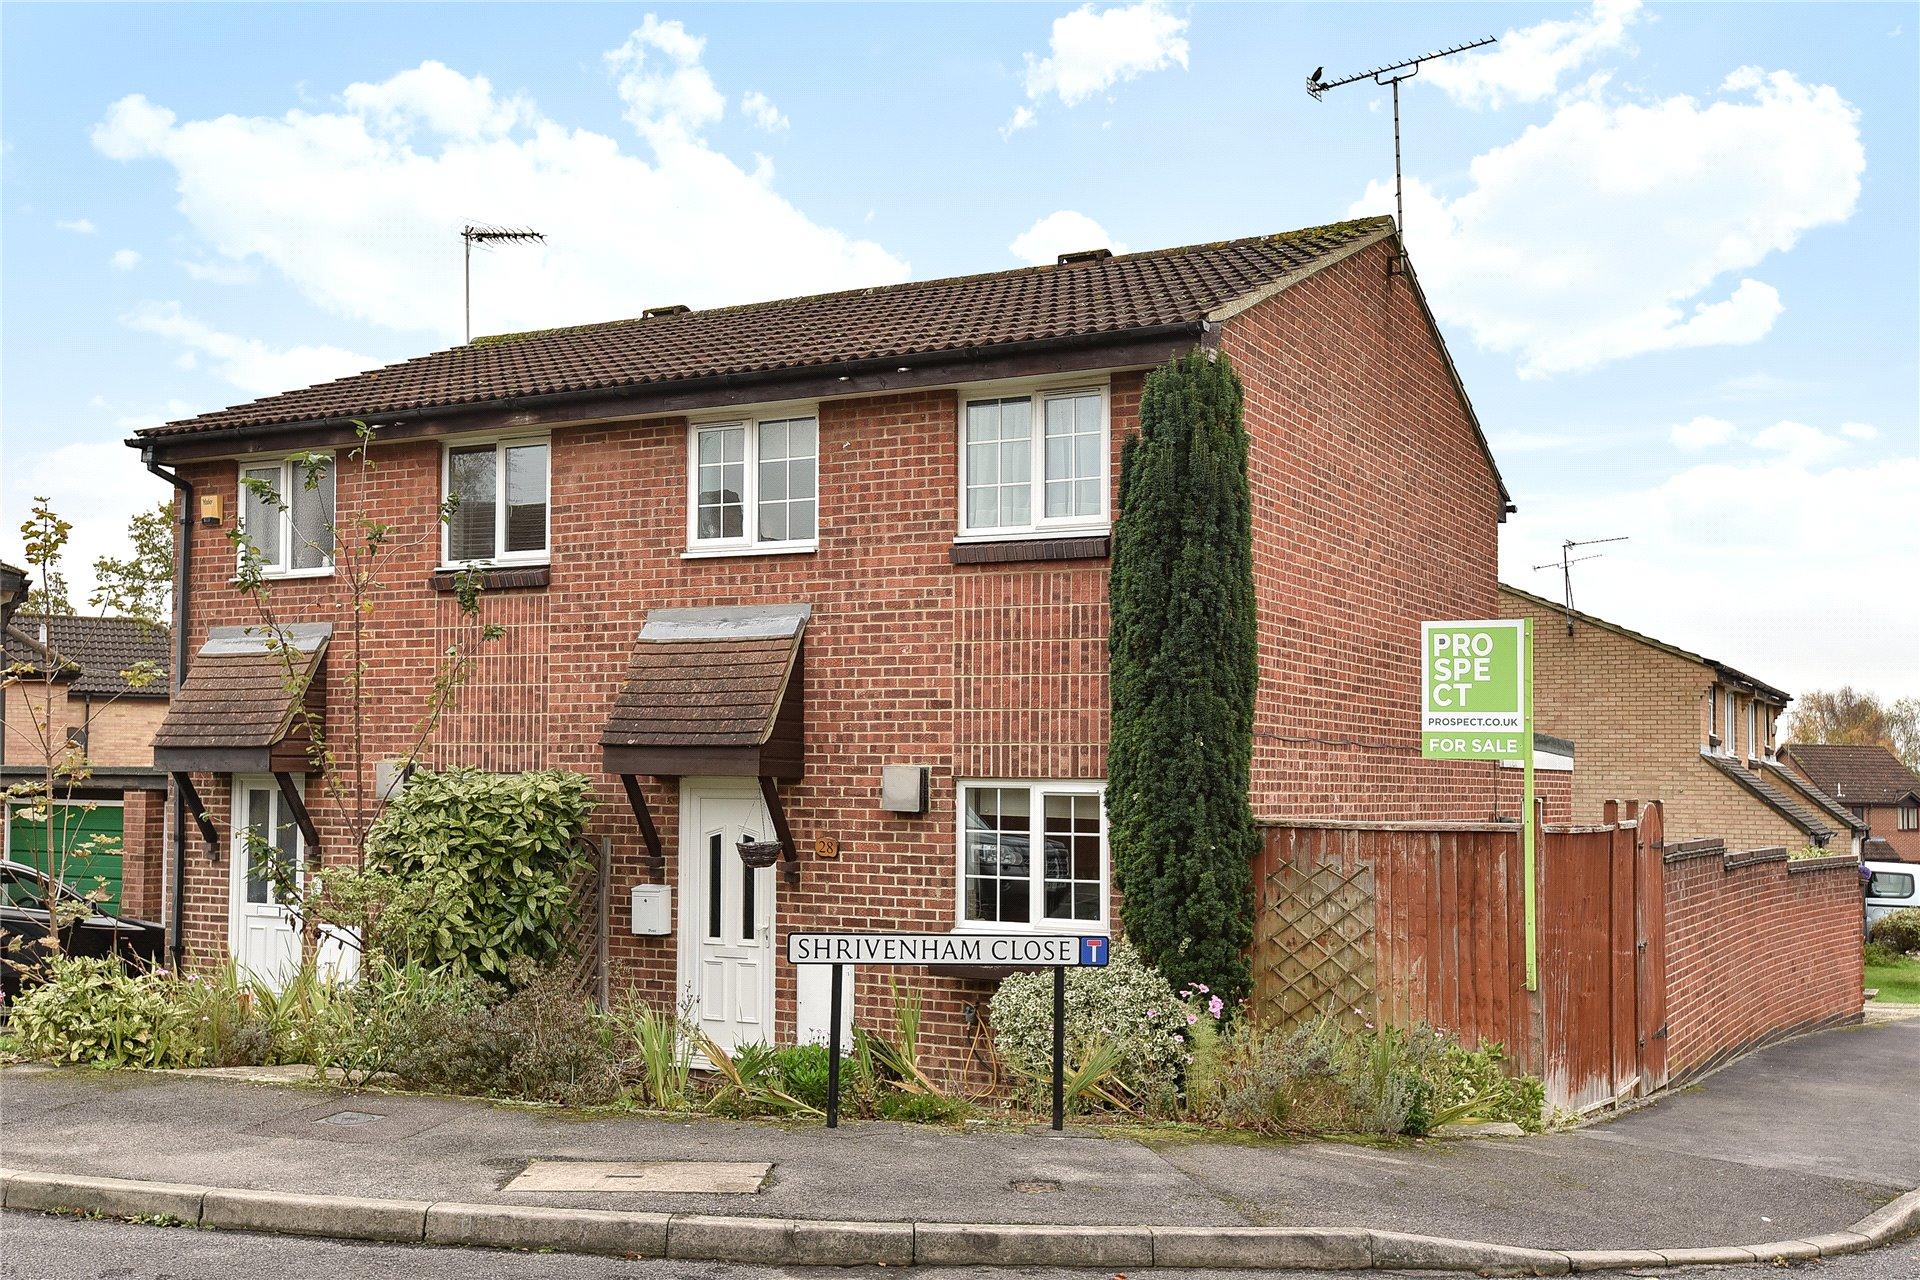 3 Bedrooms Semi Detached House for sale in Shrivenham Close, College Town, Sandhurst, Berkshire, GU47